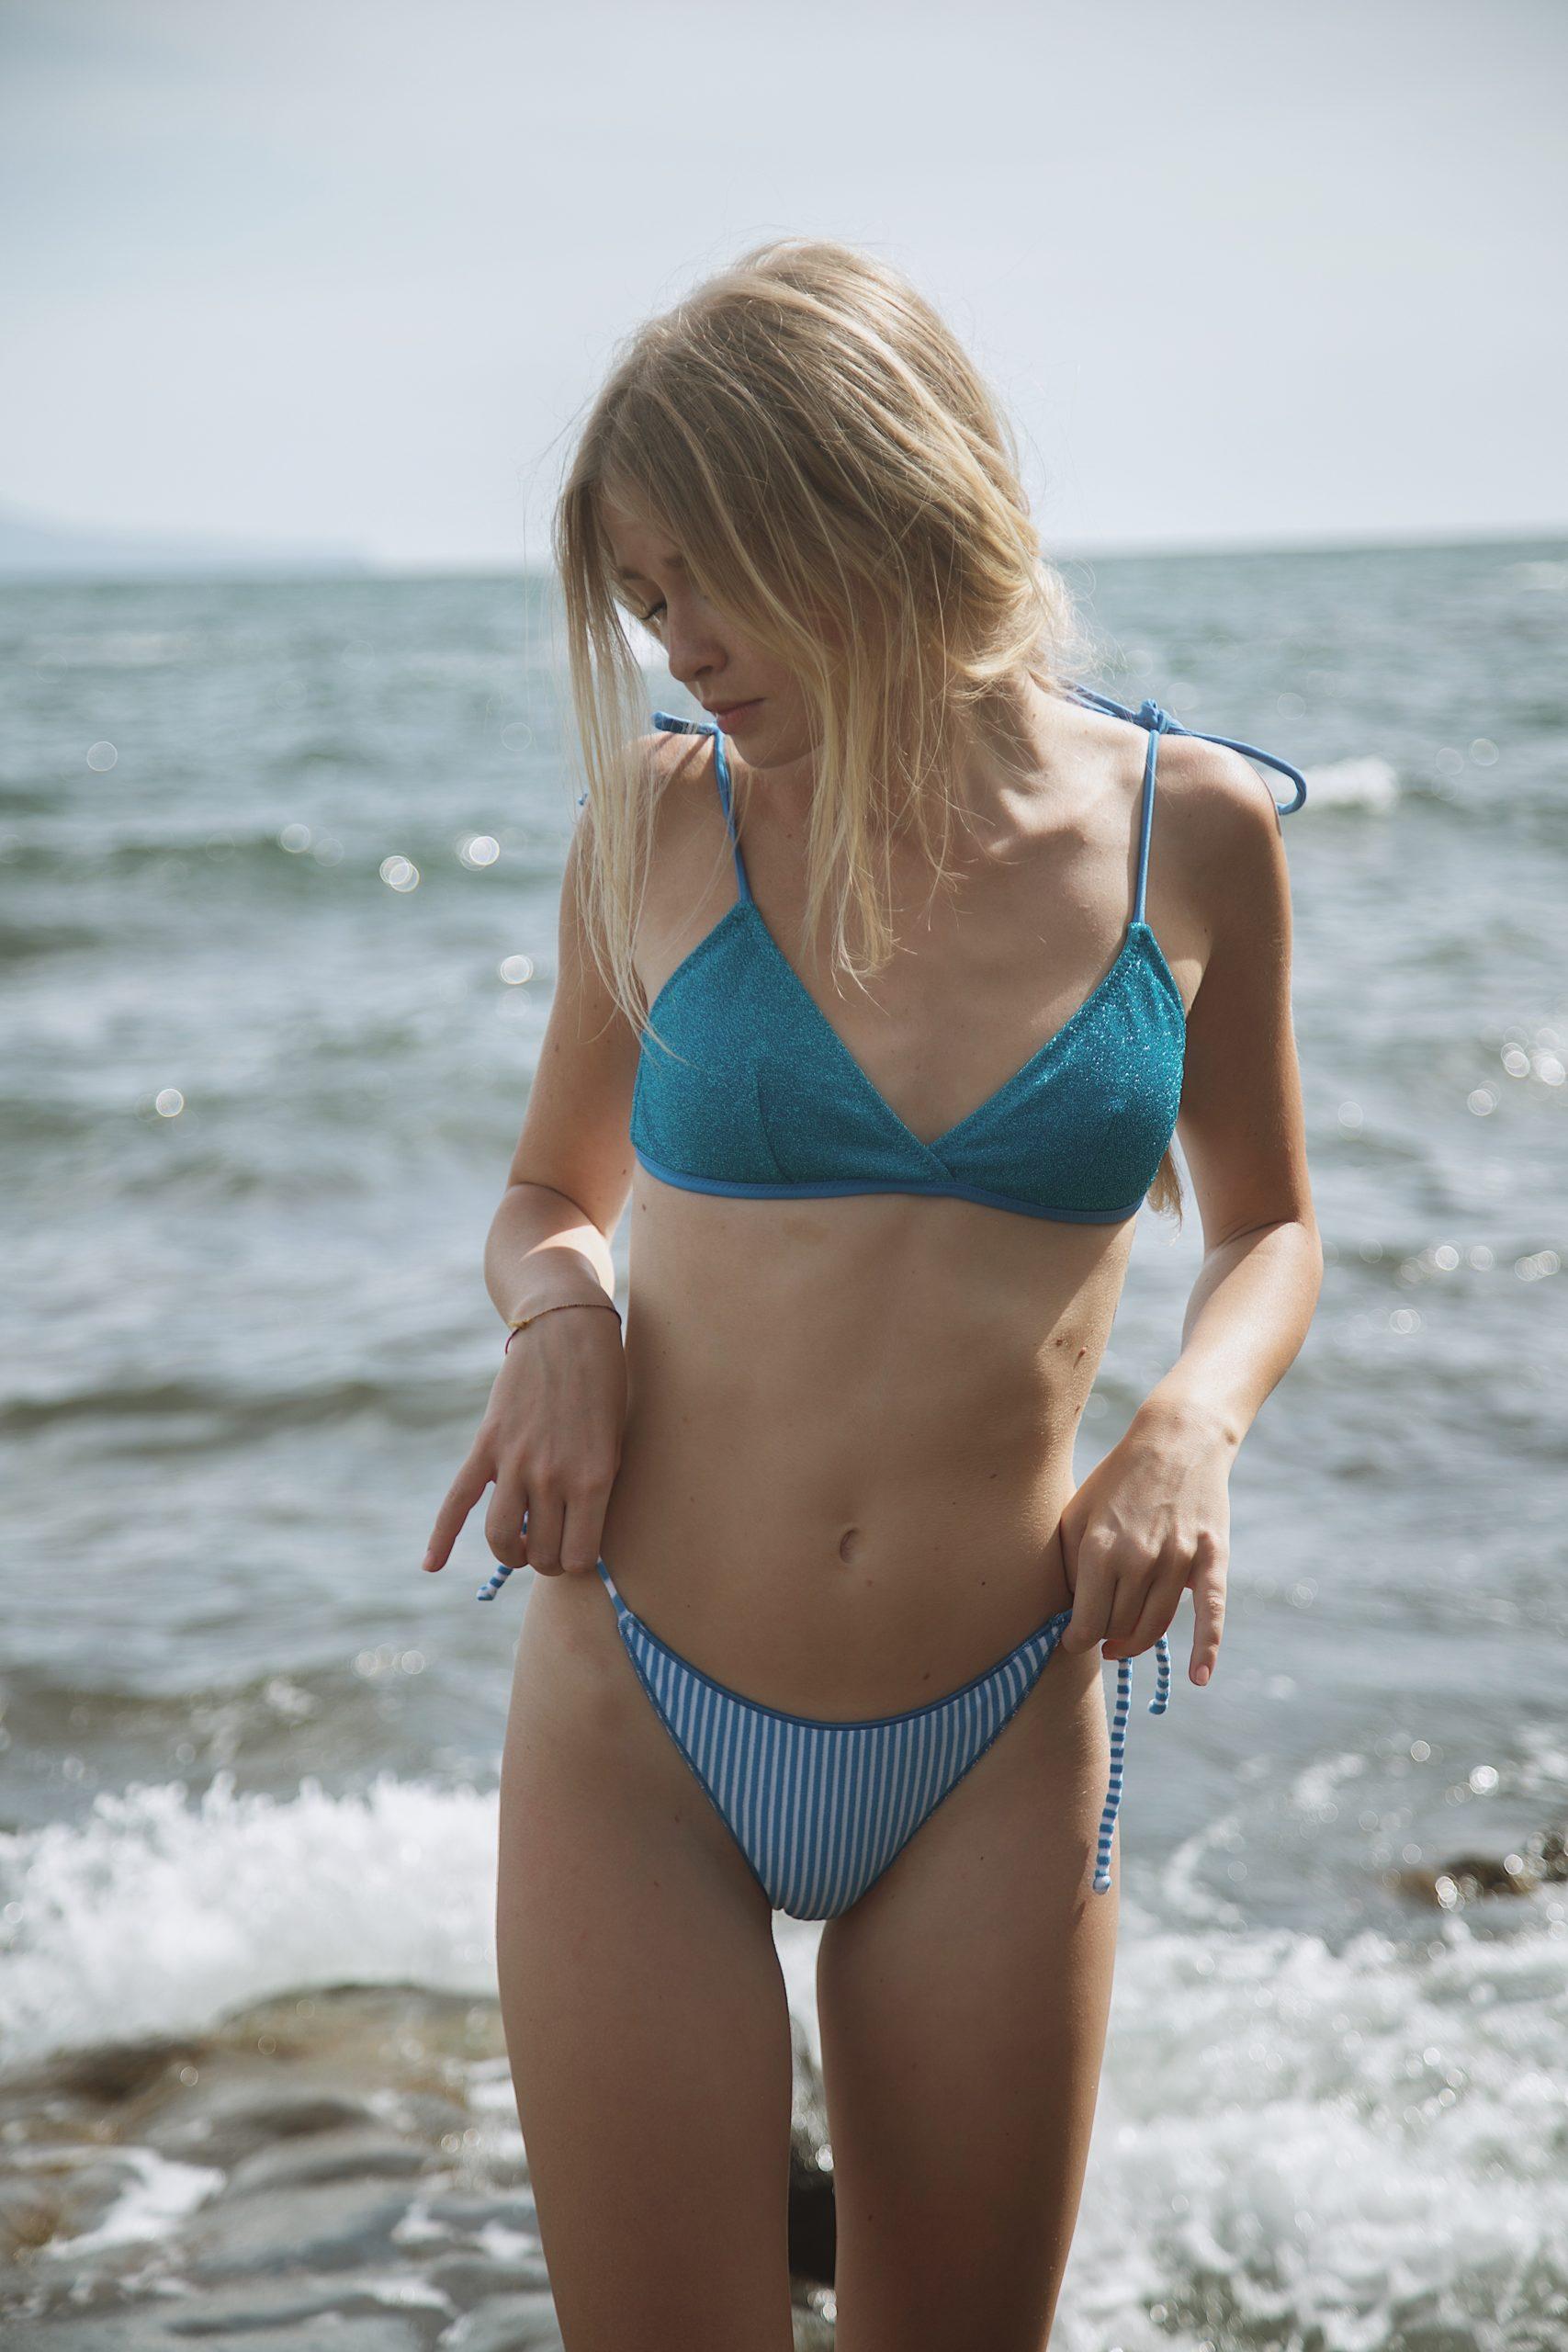 Stripes&Shine Spongy Bikini in Light Blue